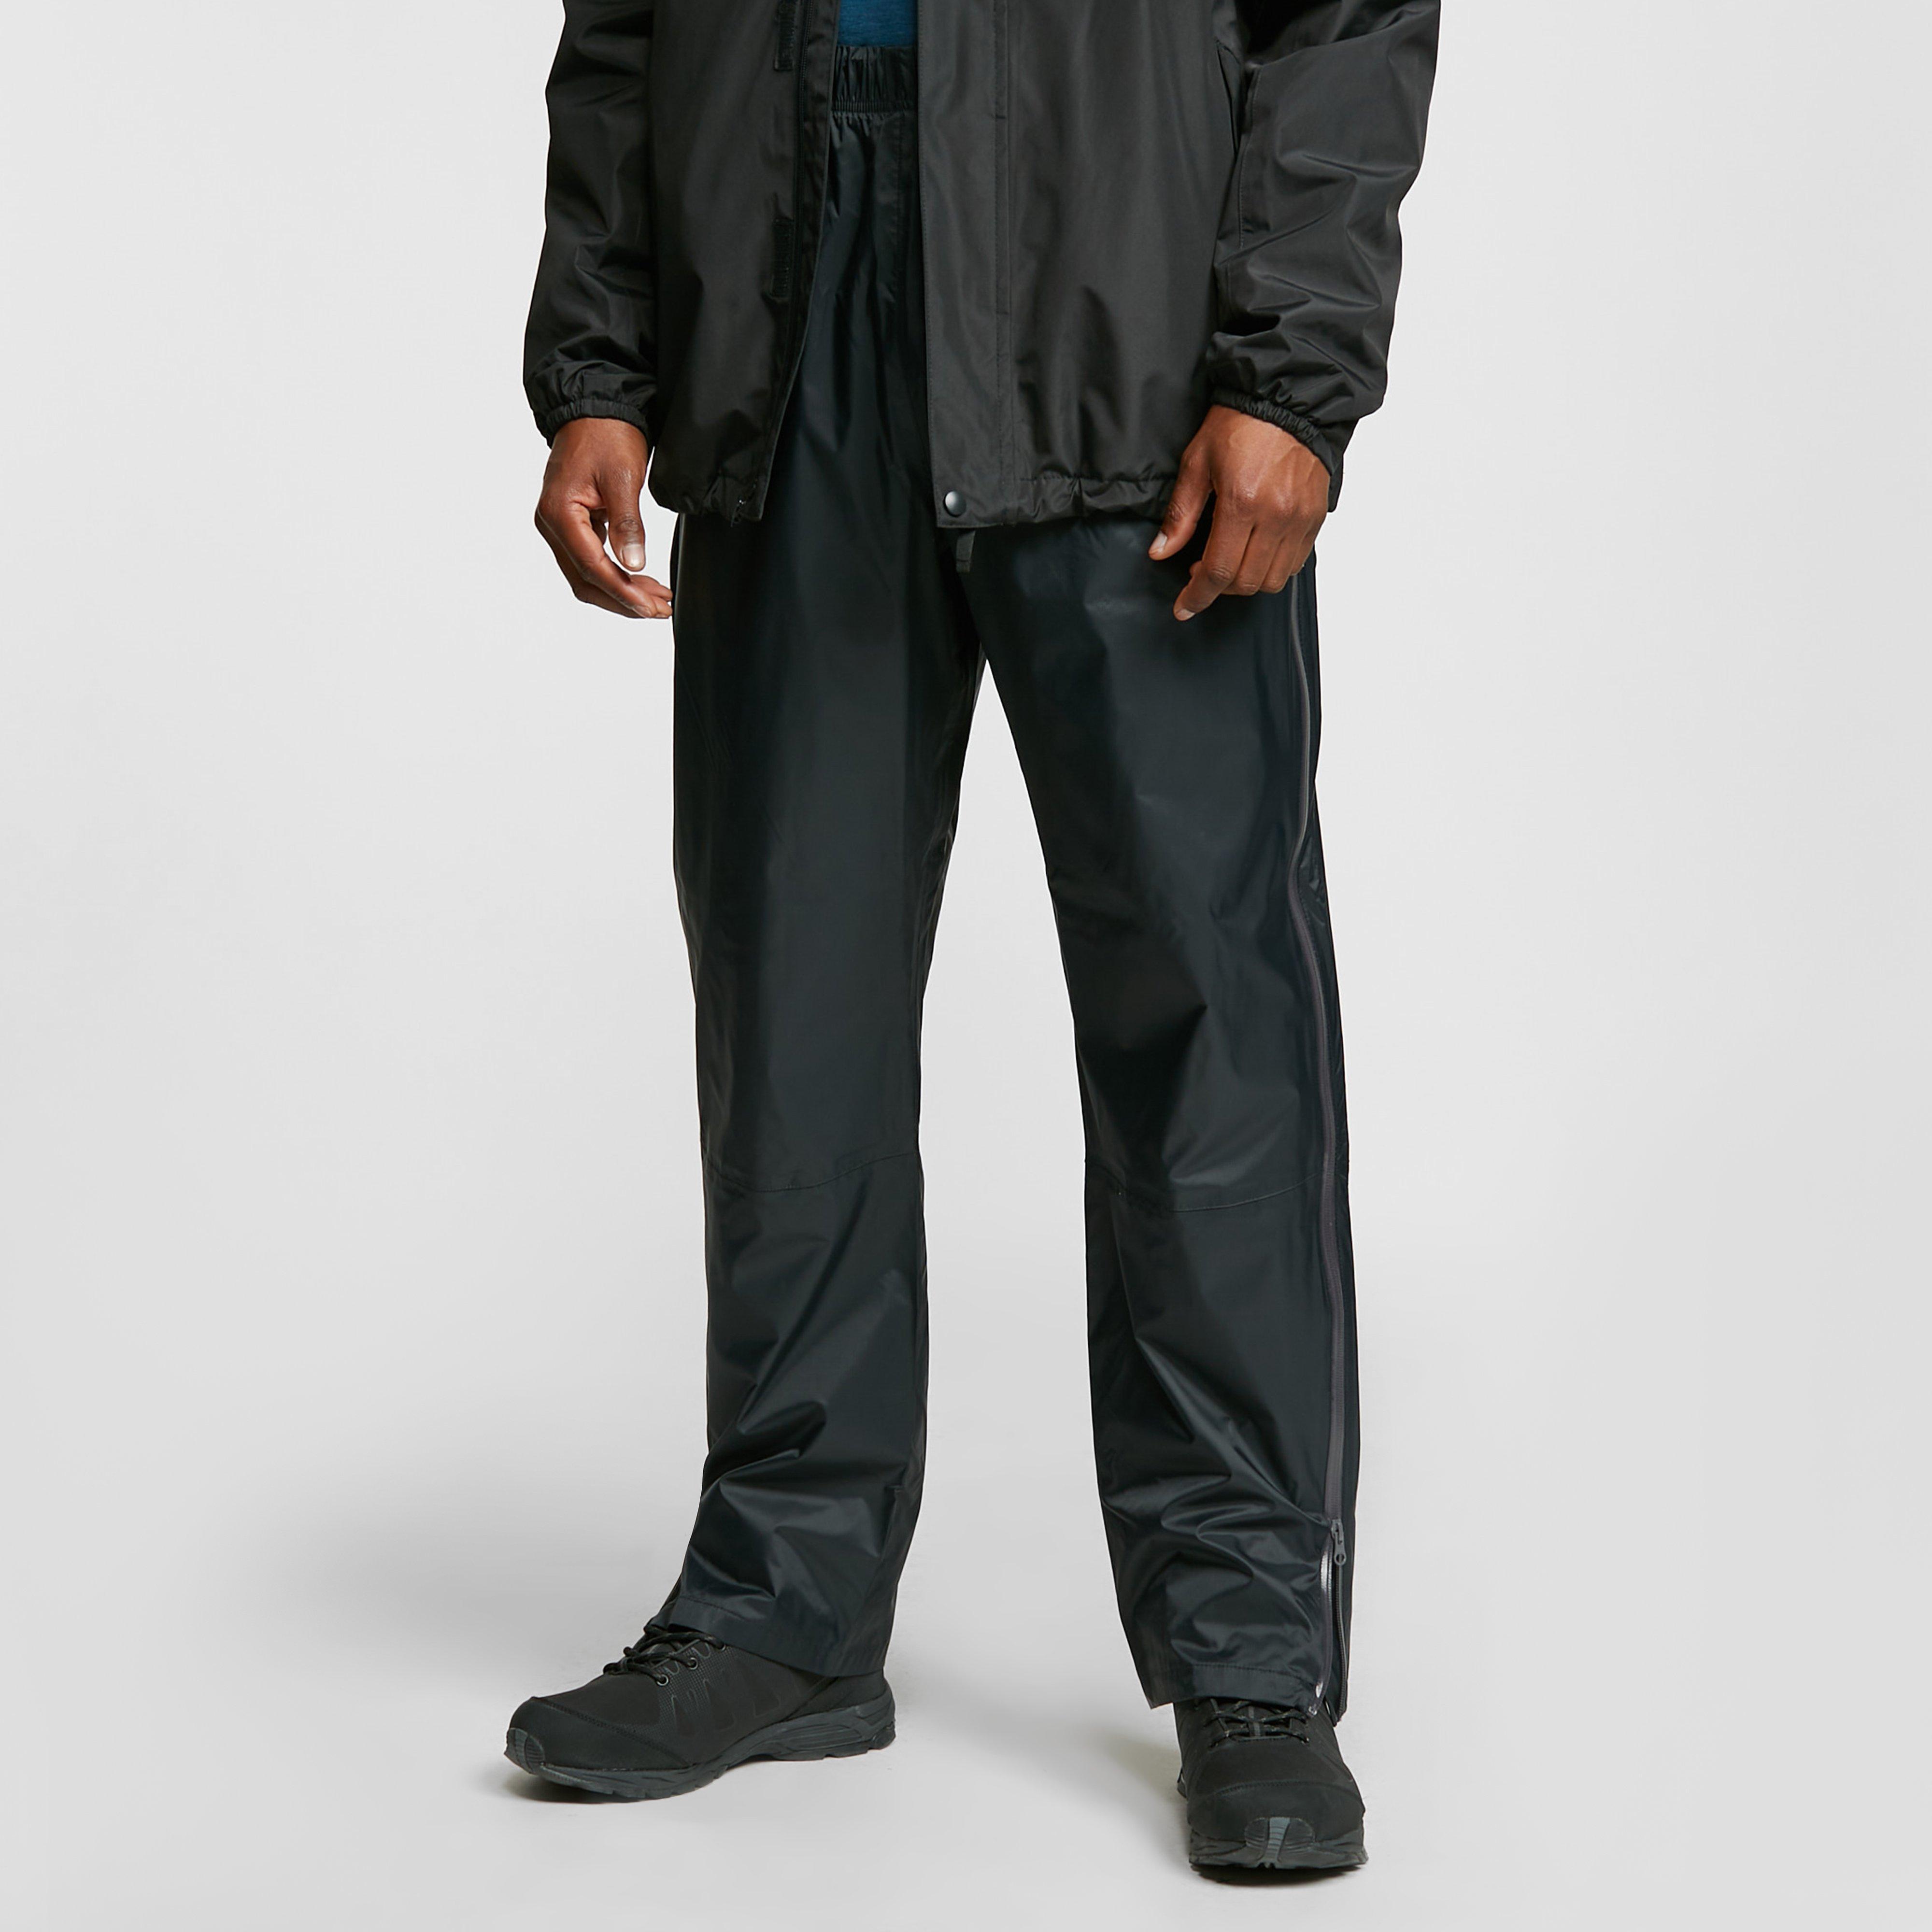 Oex Arimo Wp - Black/overtrouser  Black/overtrouser